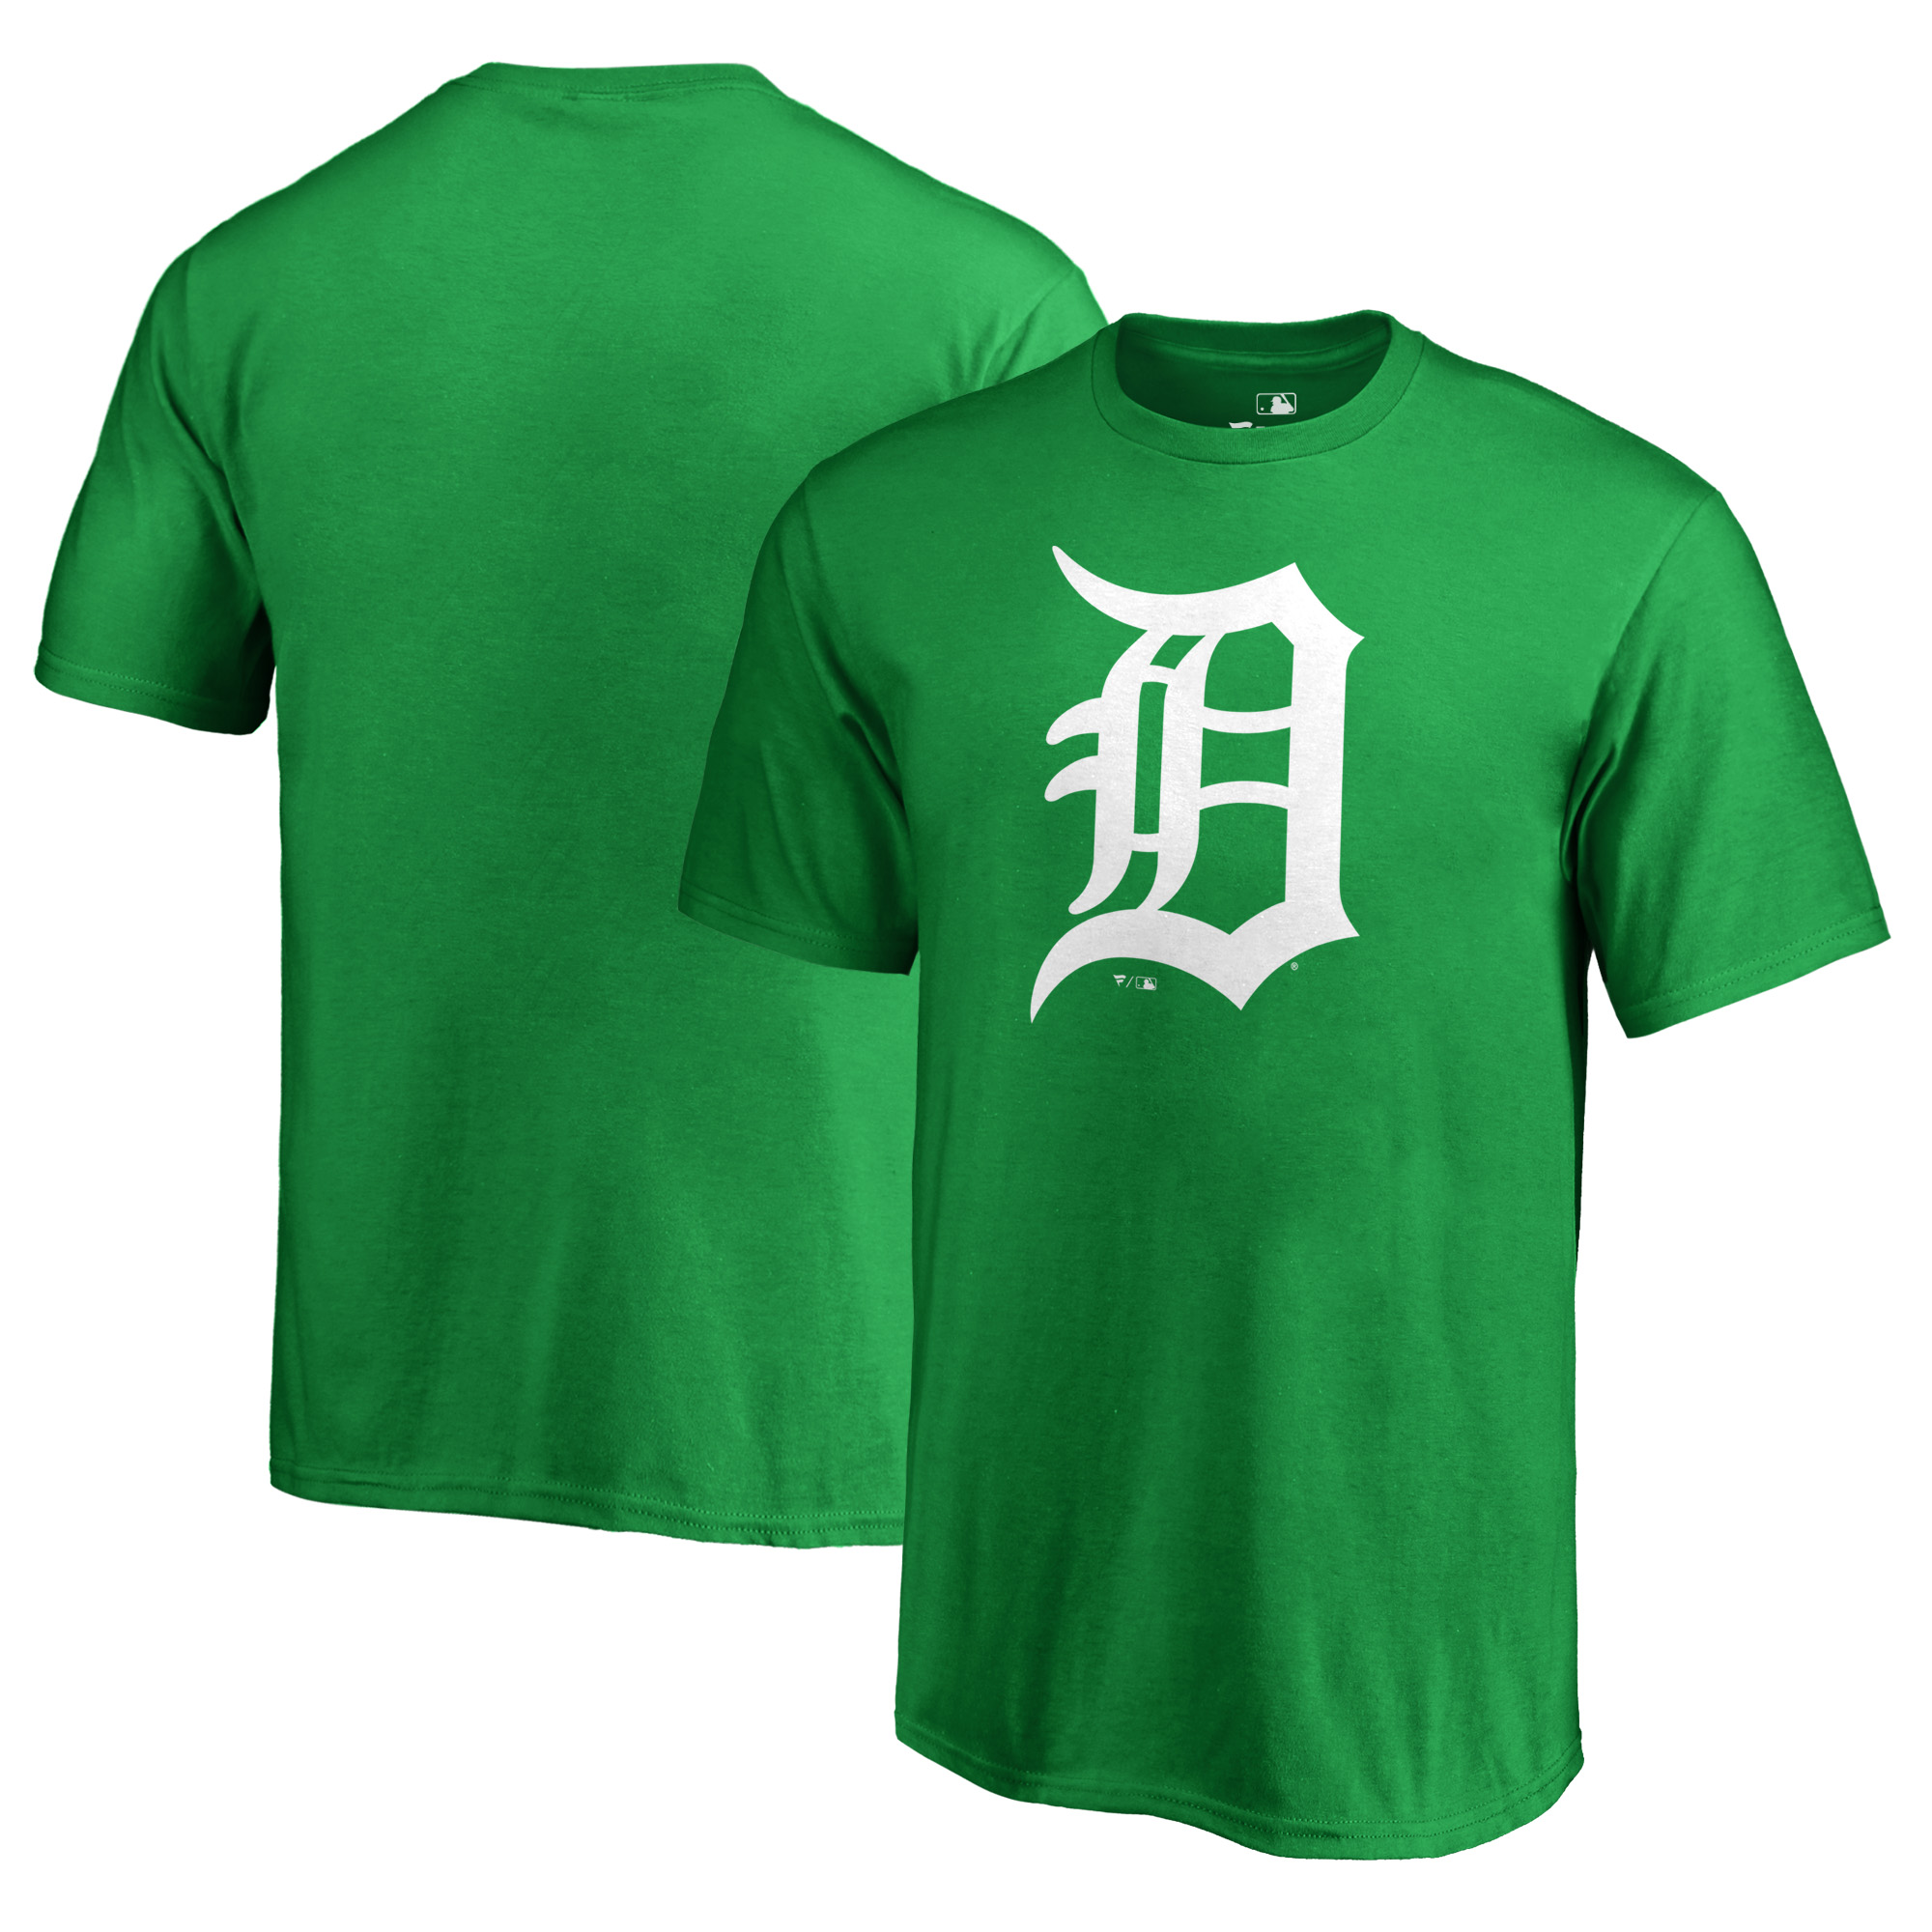 Detroit Tigers Fanatics Branded Youth St. Patrick's Day White Logo T-Shirt - Kelly Green